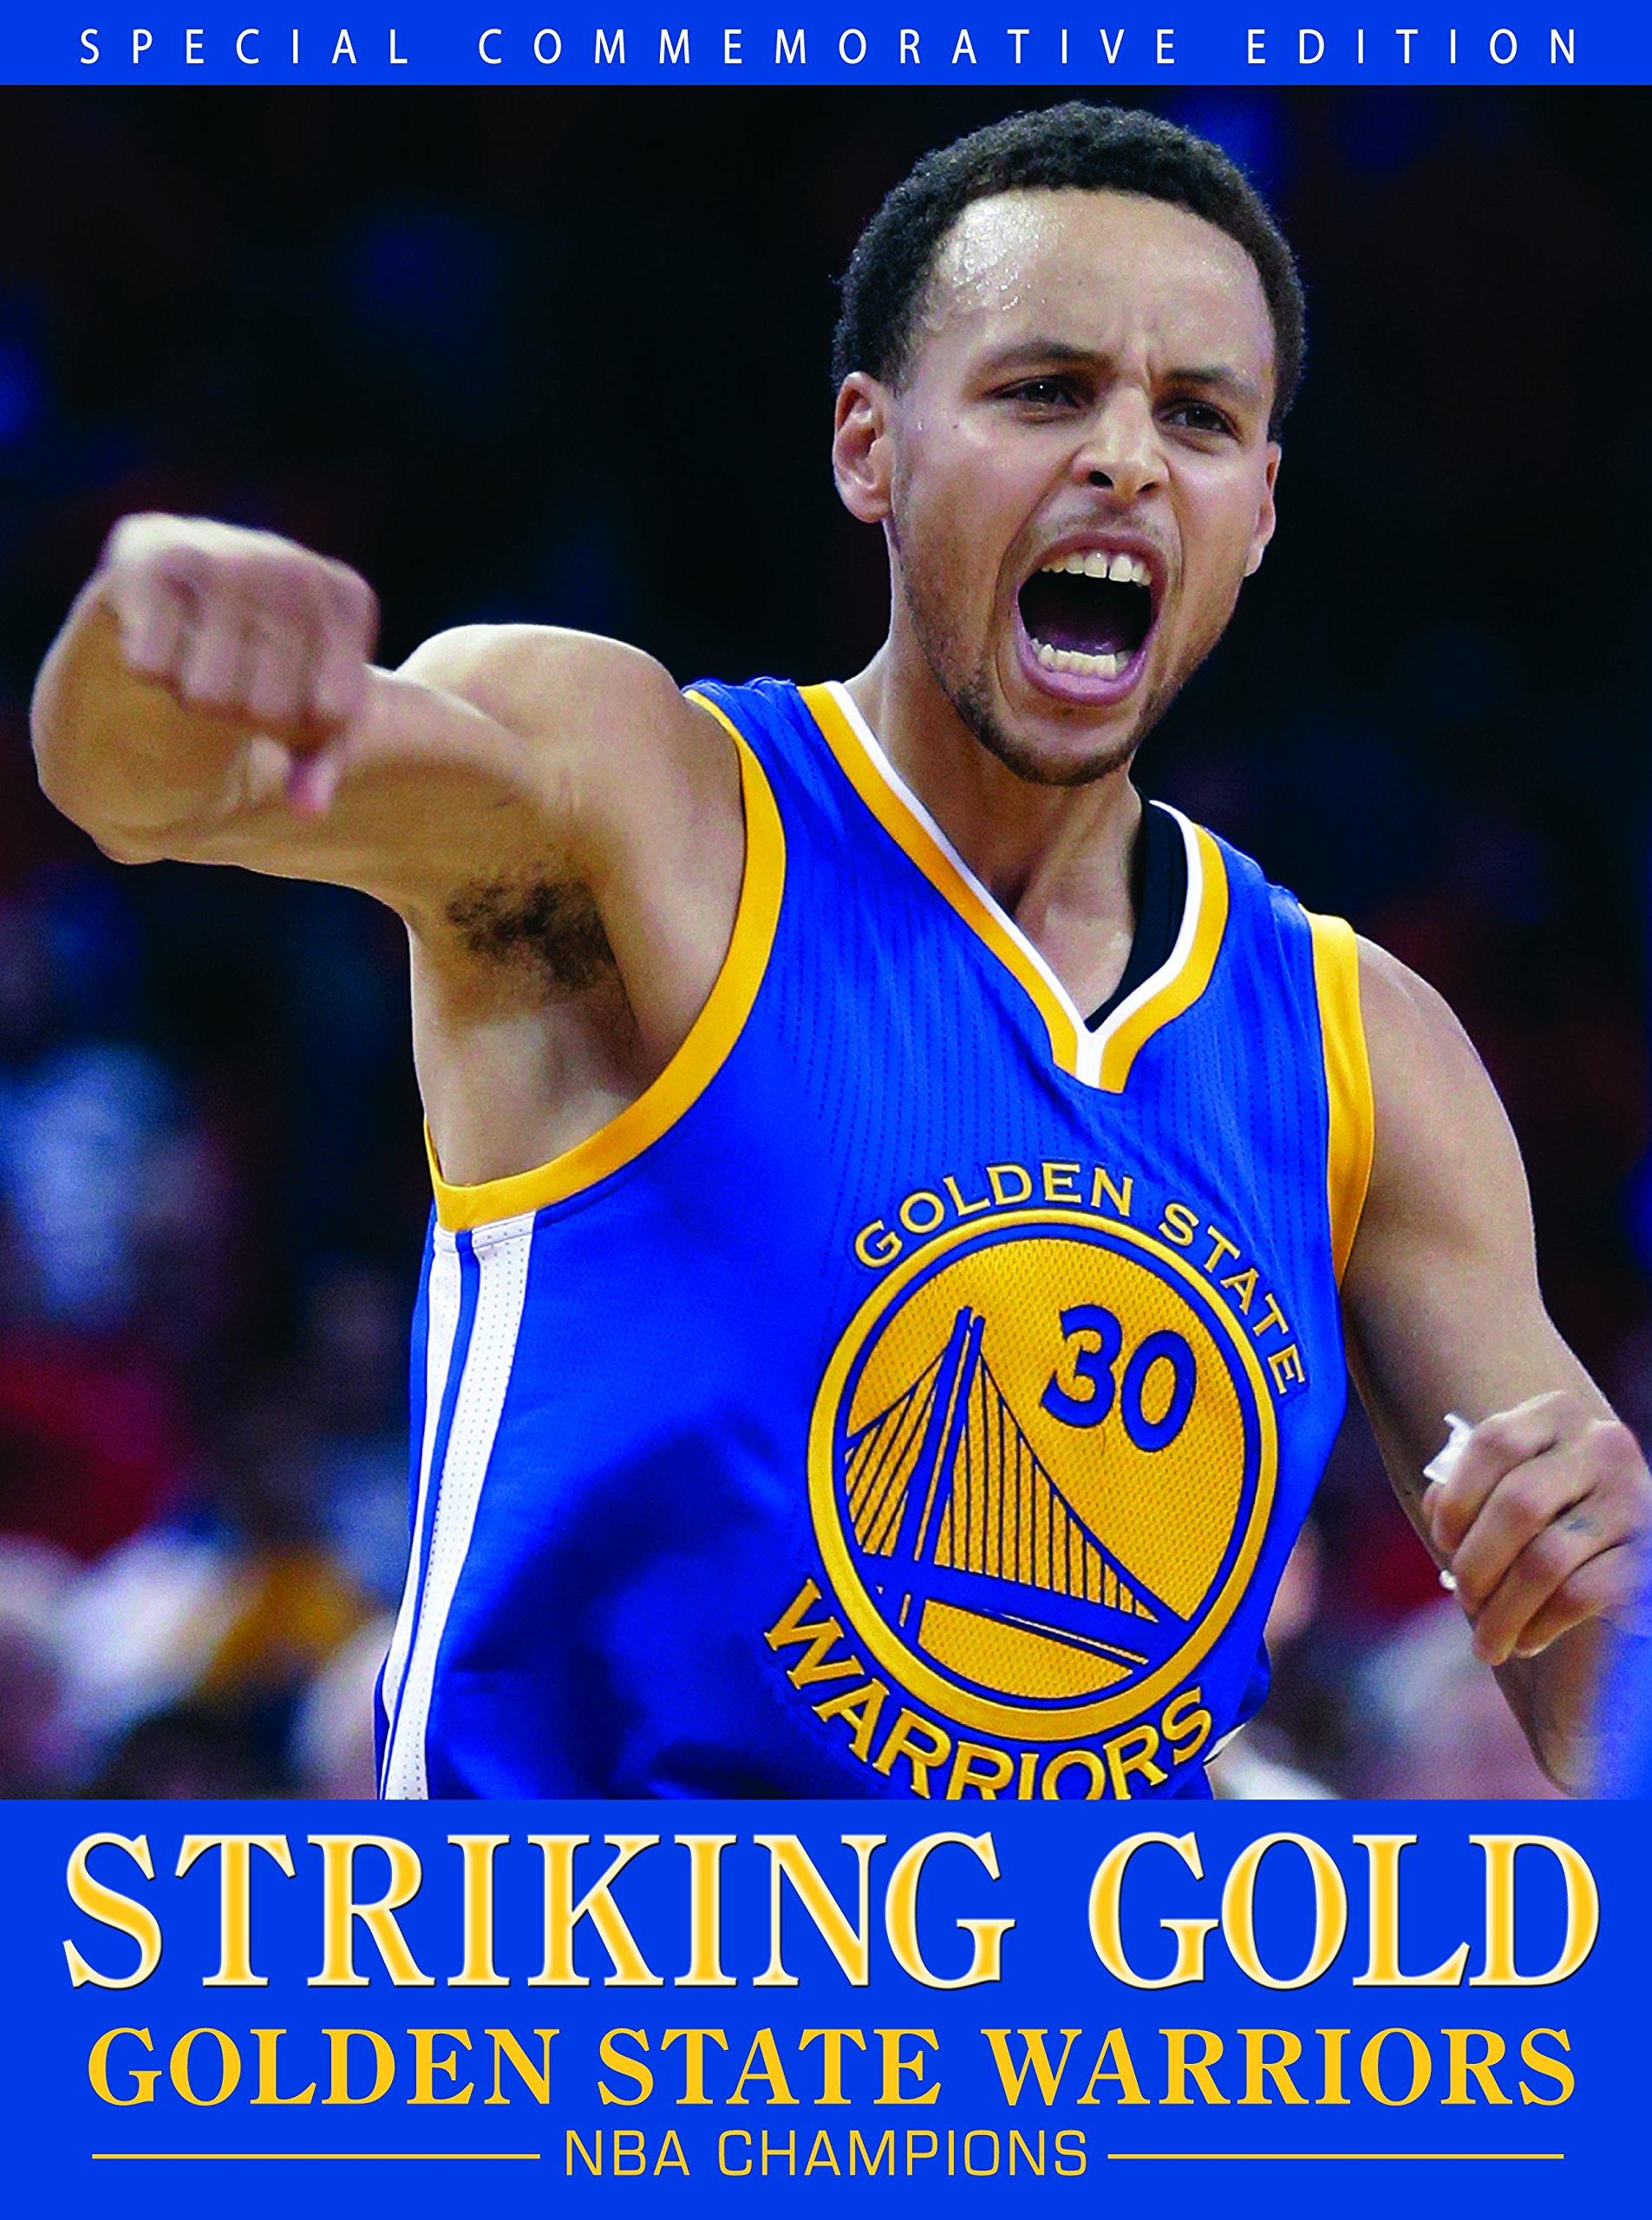 Striking Gold Golden State Warriors Nba Champions Kci Sports